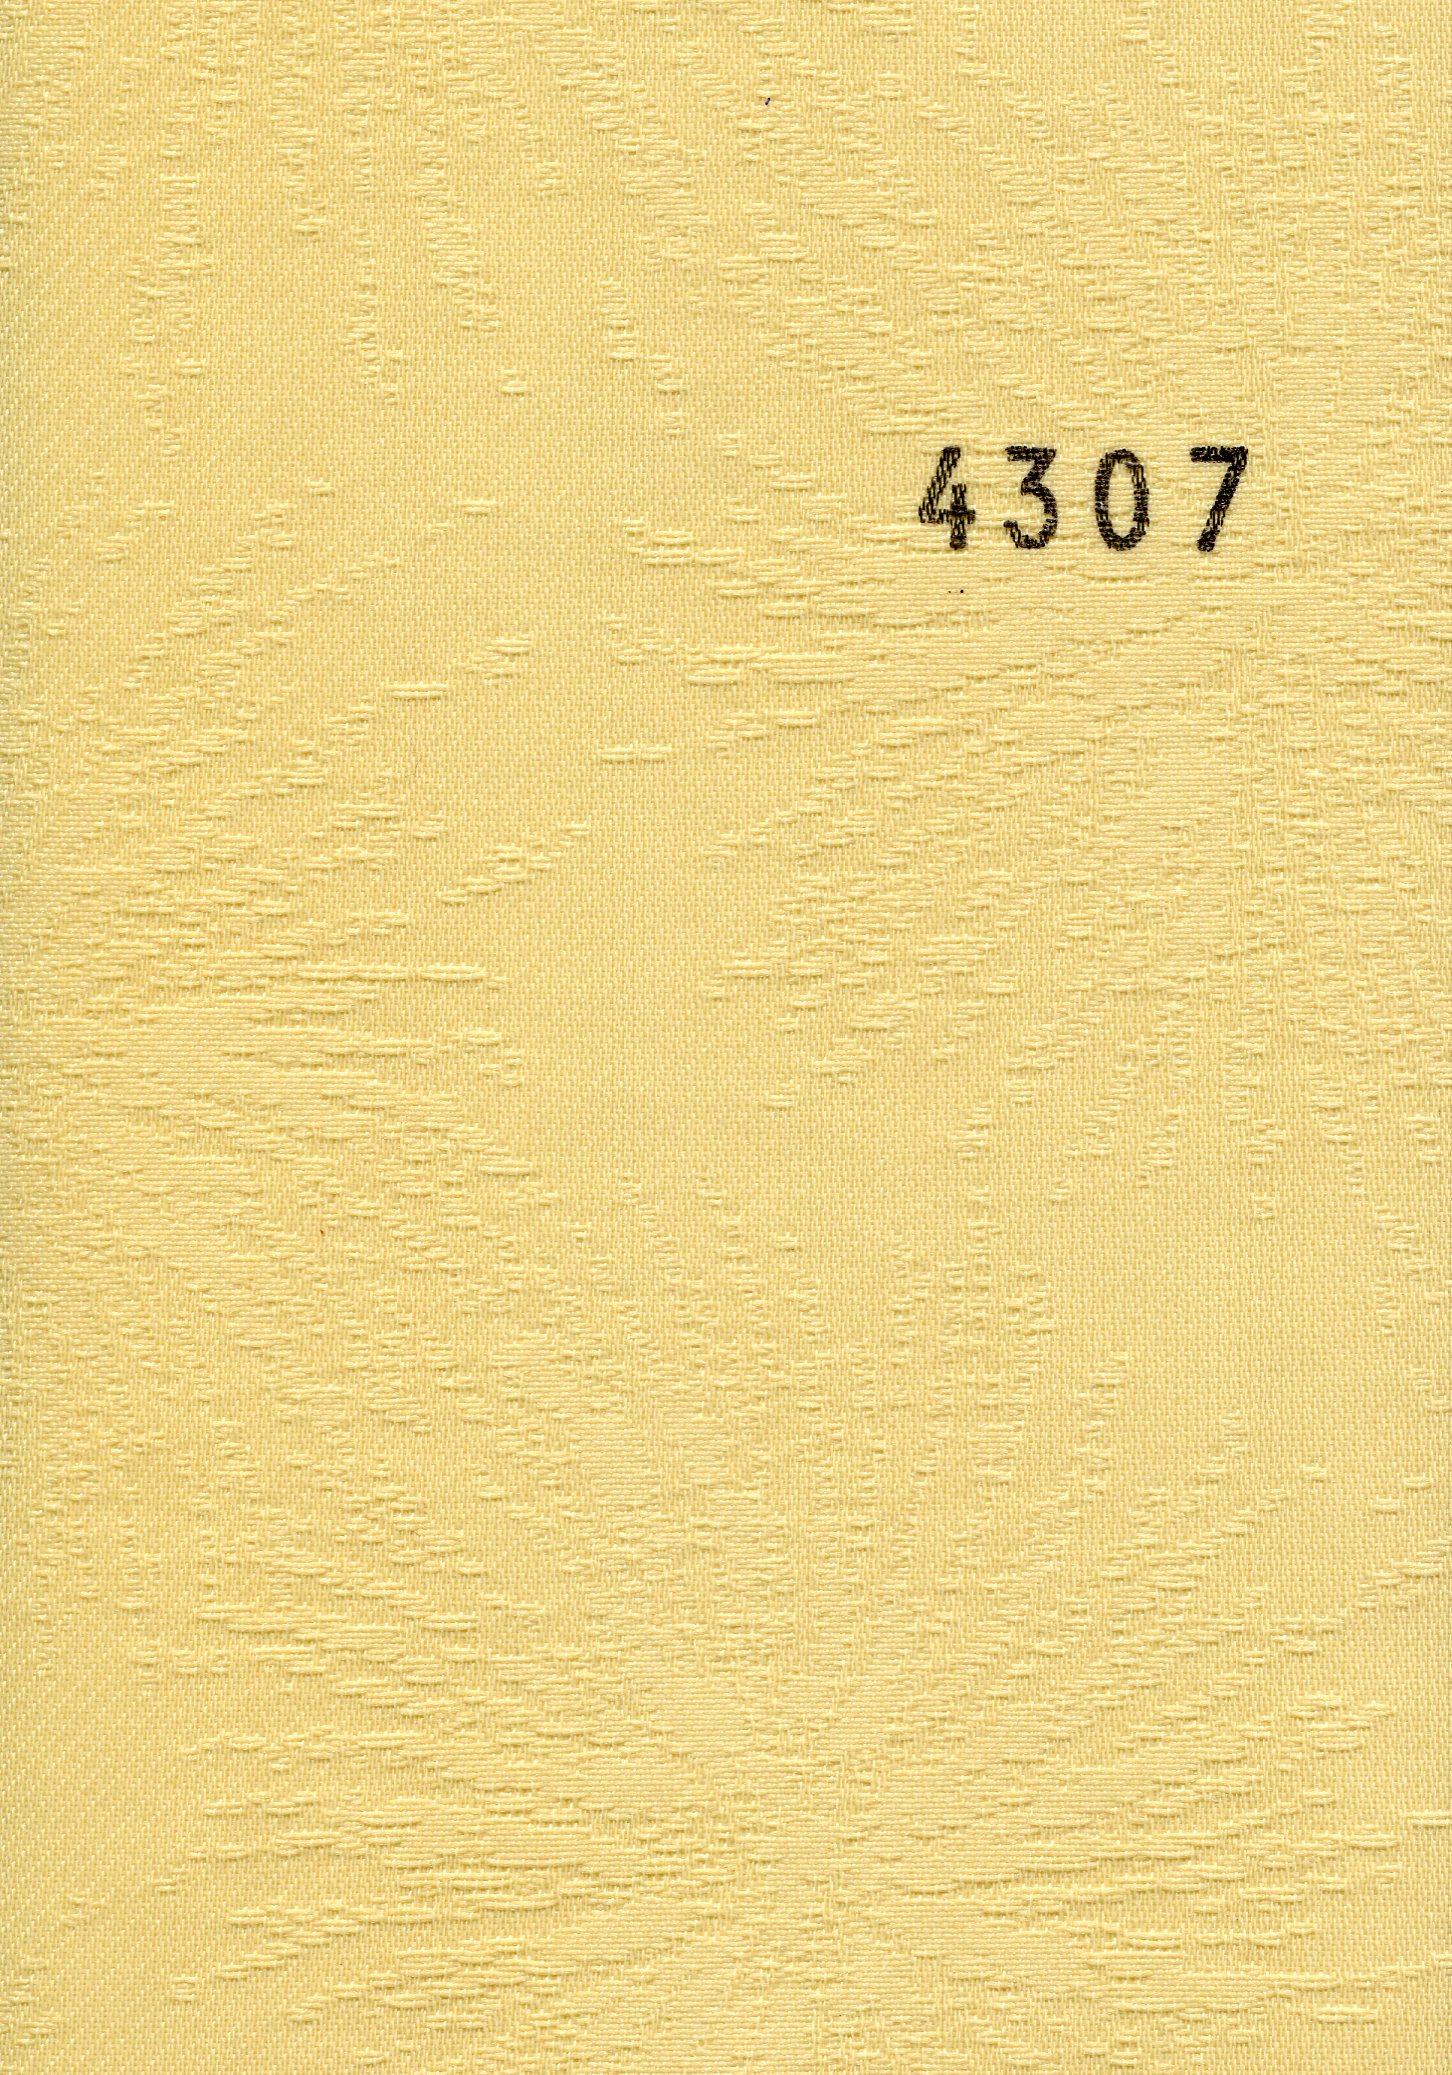 Tropic 4307